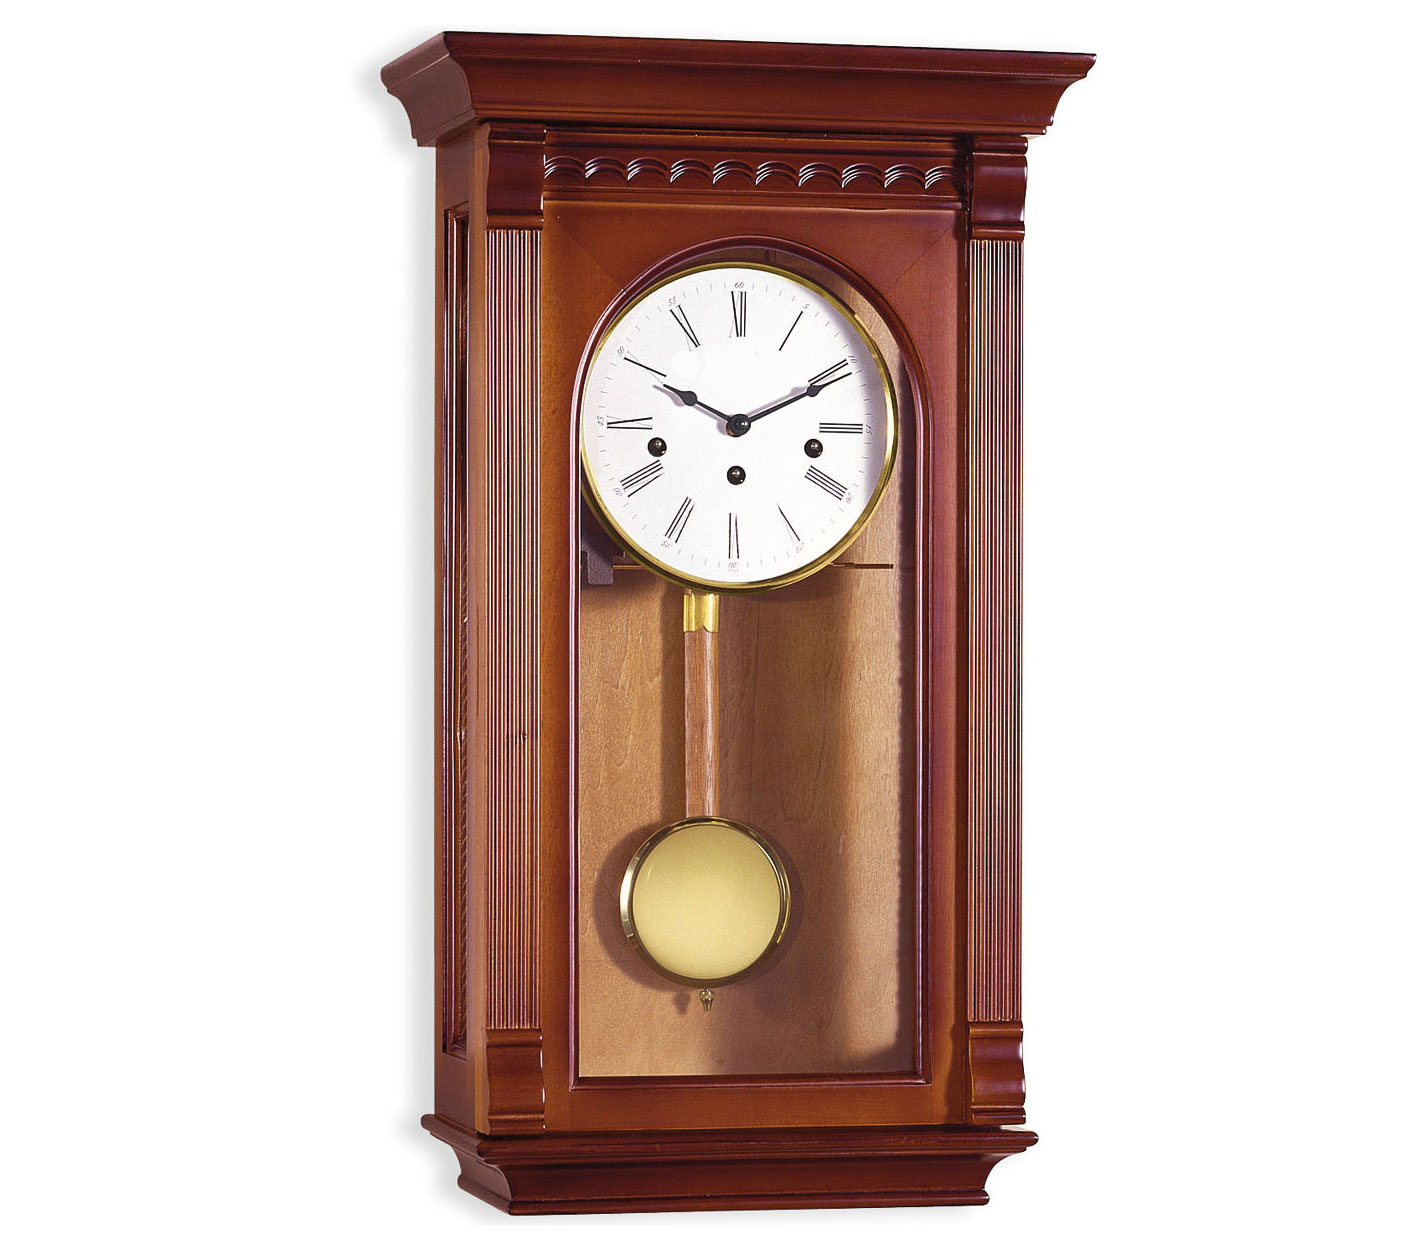 Reloj de pendulo de pared mec nico 58 cm alta calidad - Relojes rusticos de pared ...